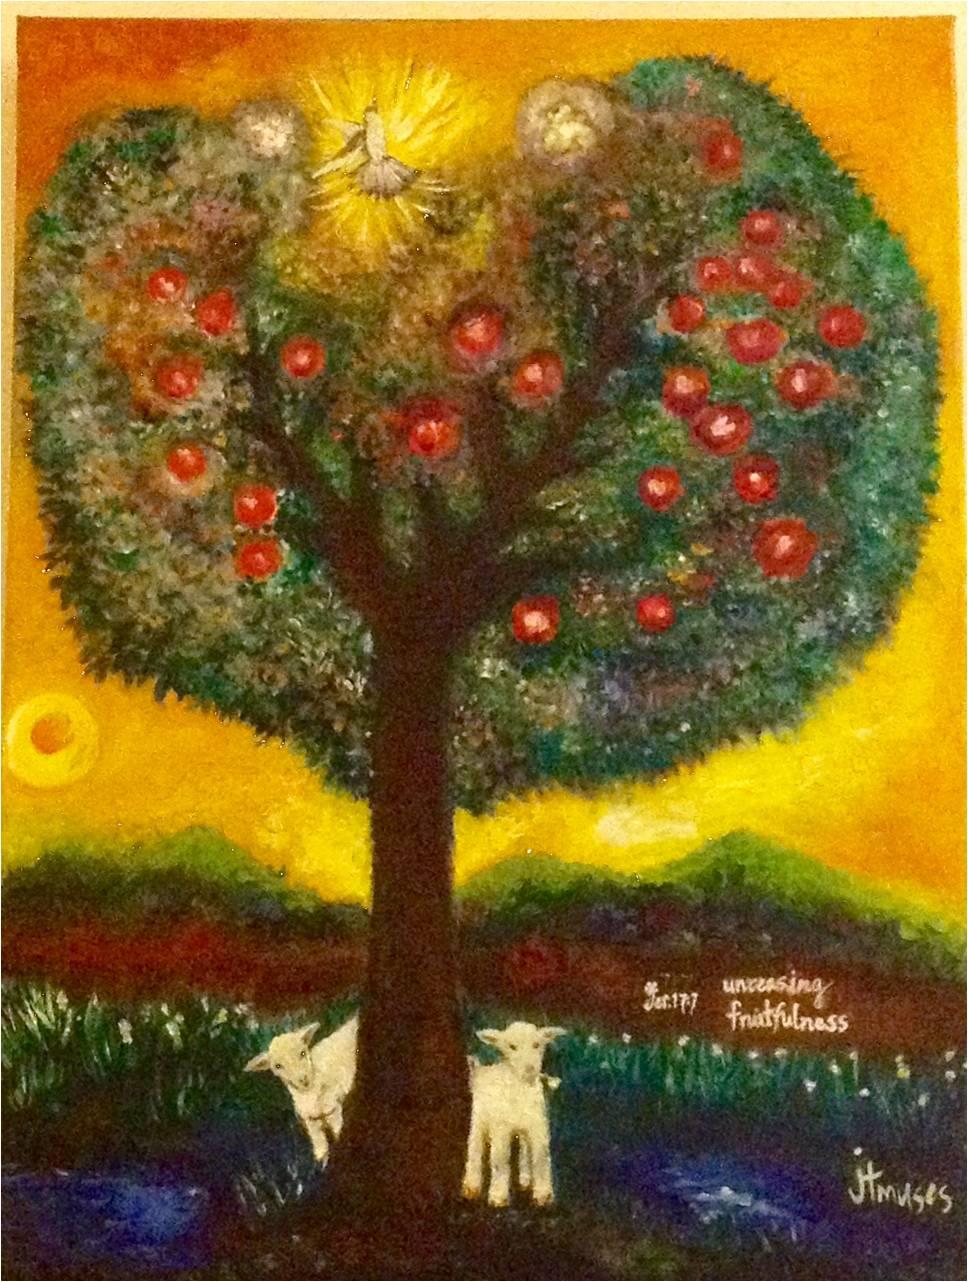 Unceasing Fruitfulness